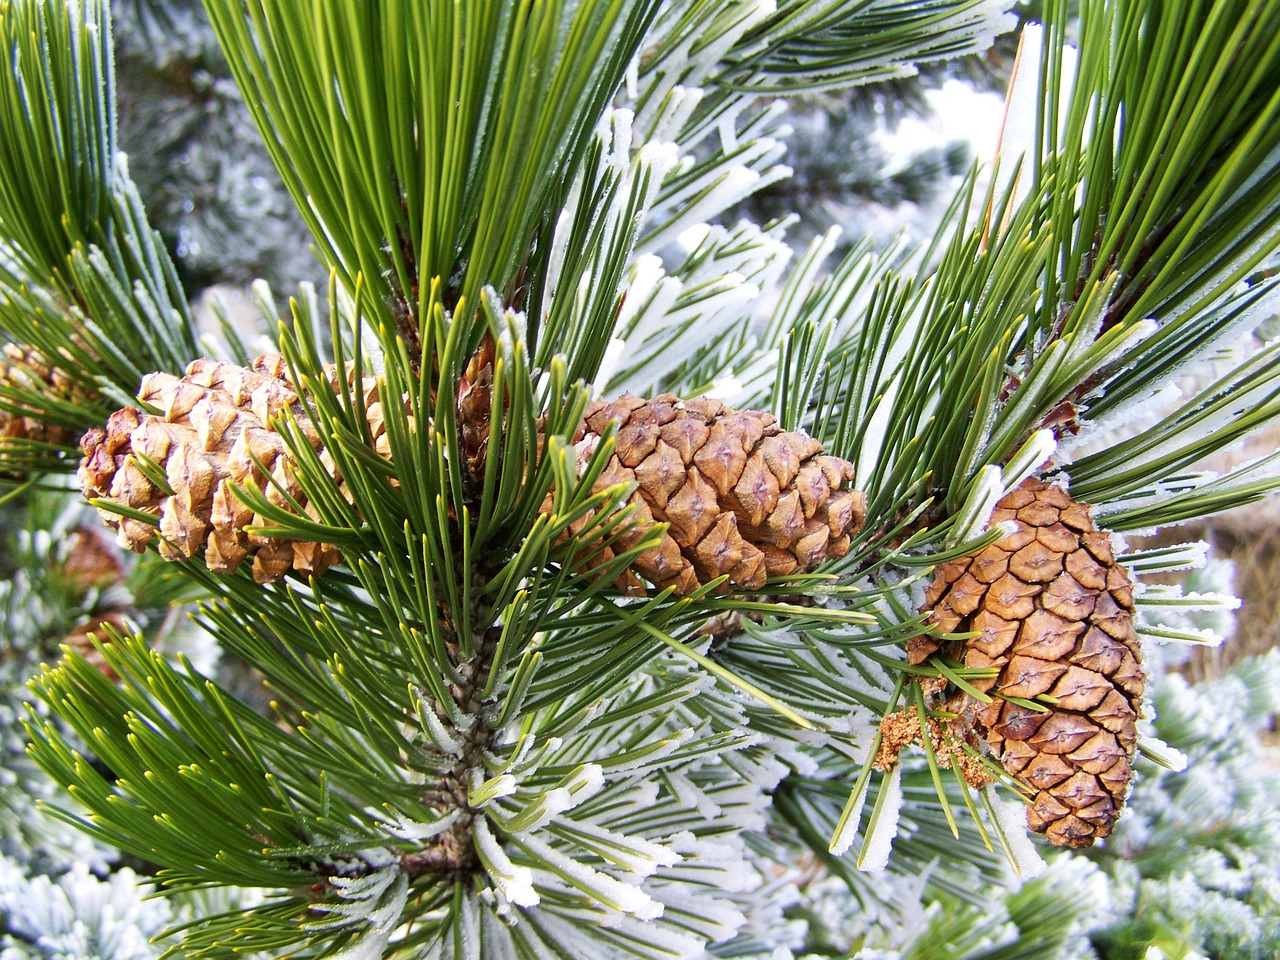 winter-1981190_1280.jpg